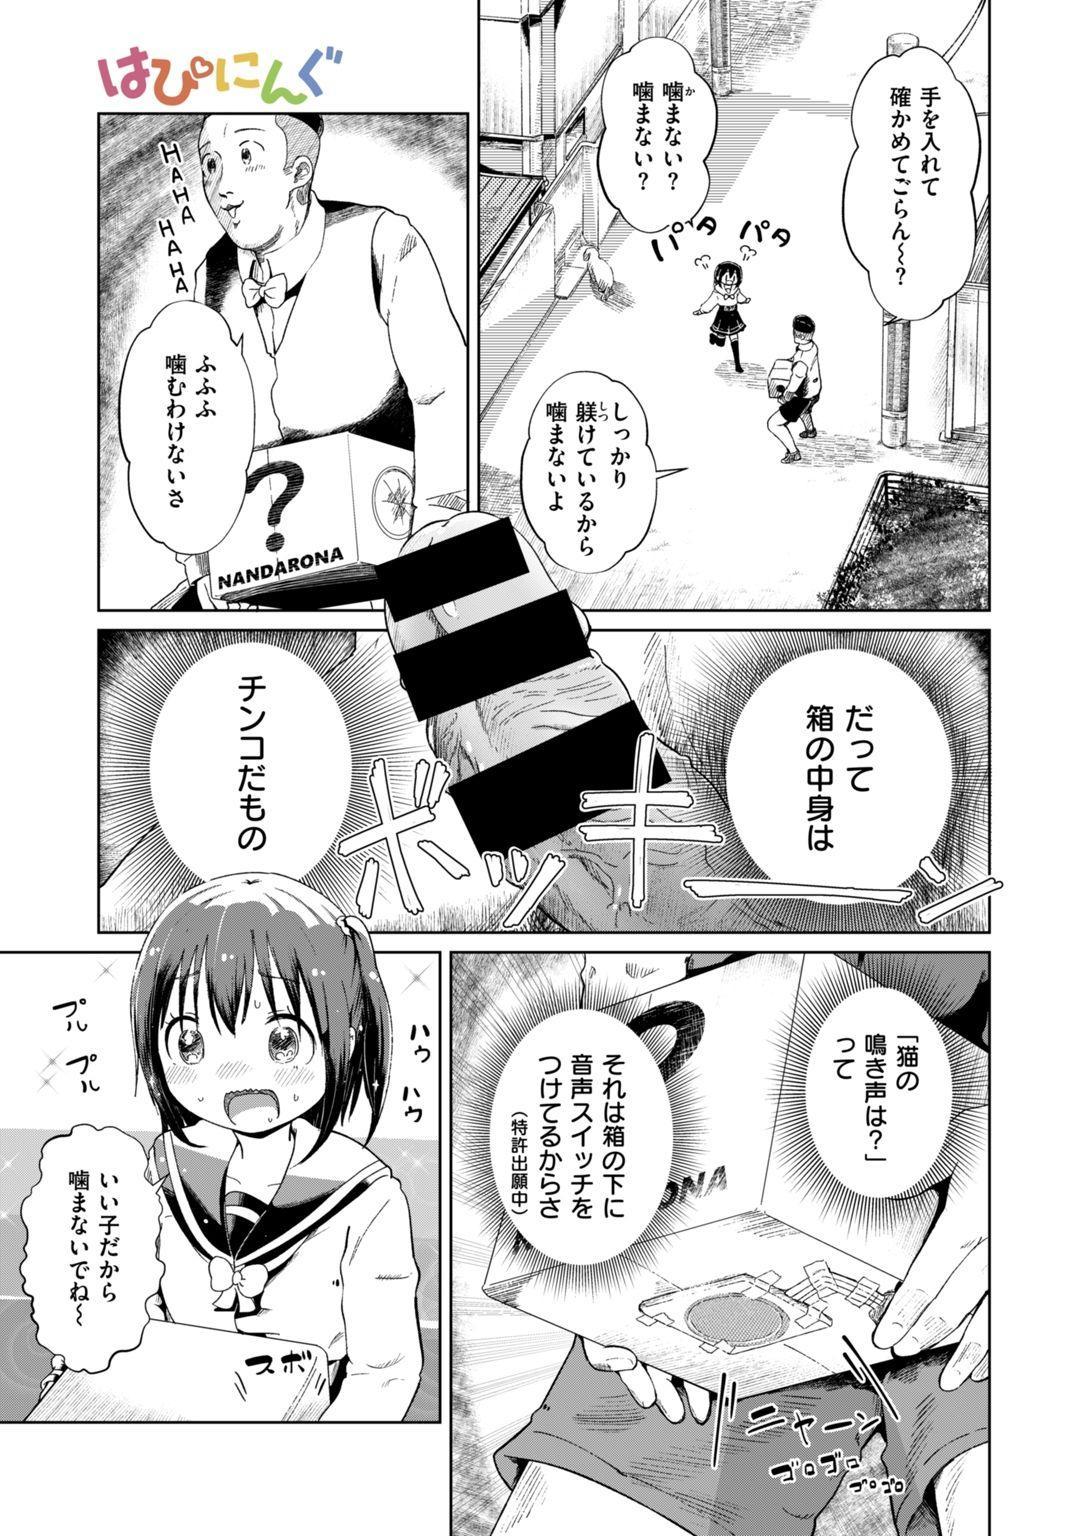 COMIC HAPPINING Vol. 2 119